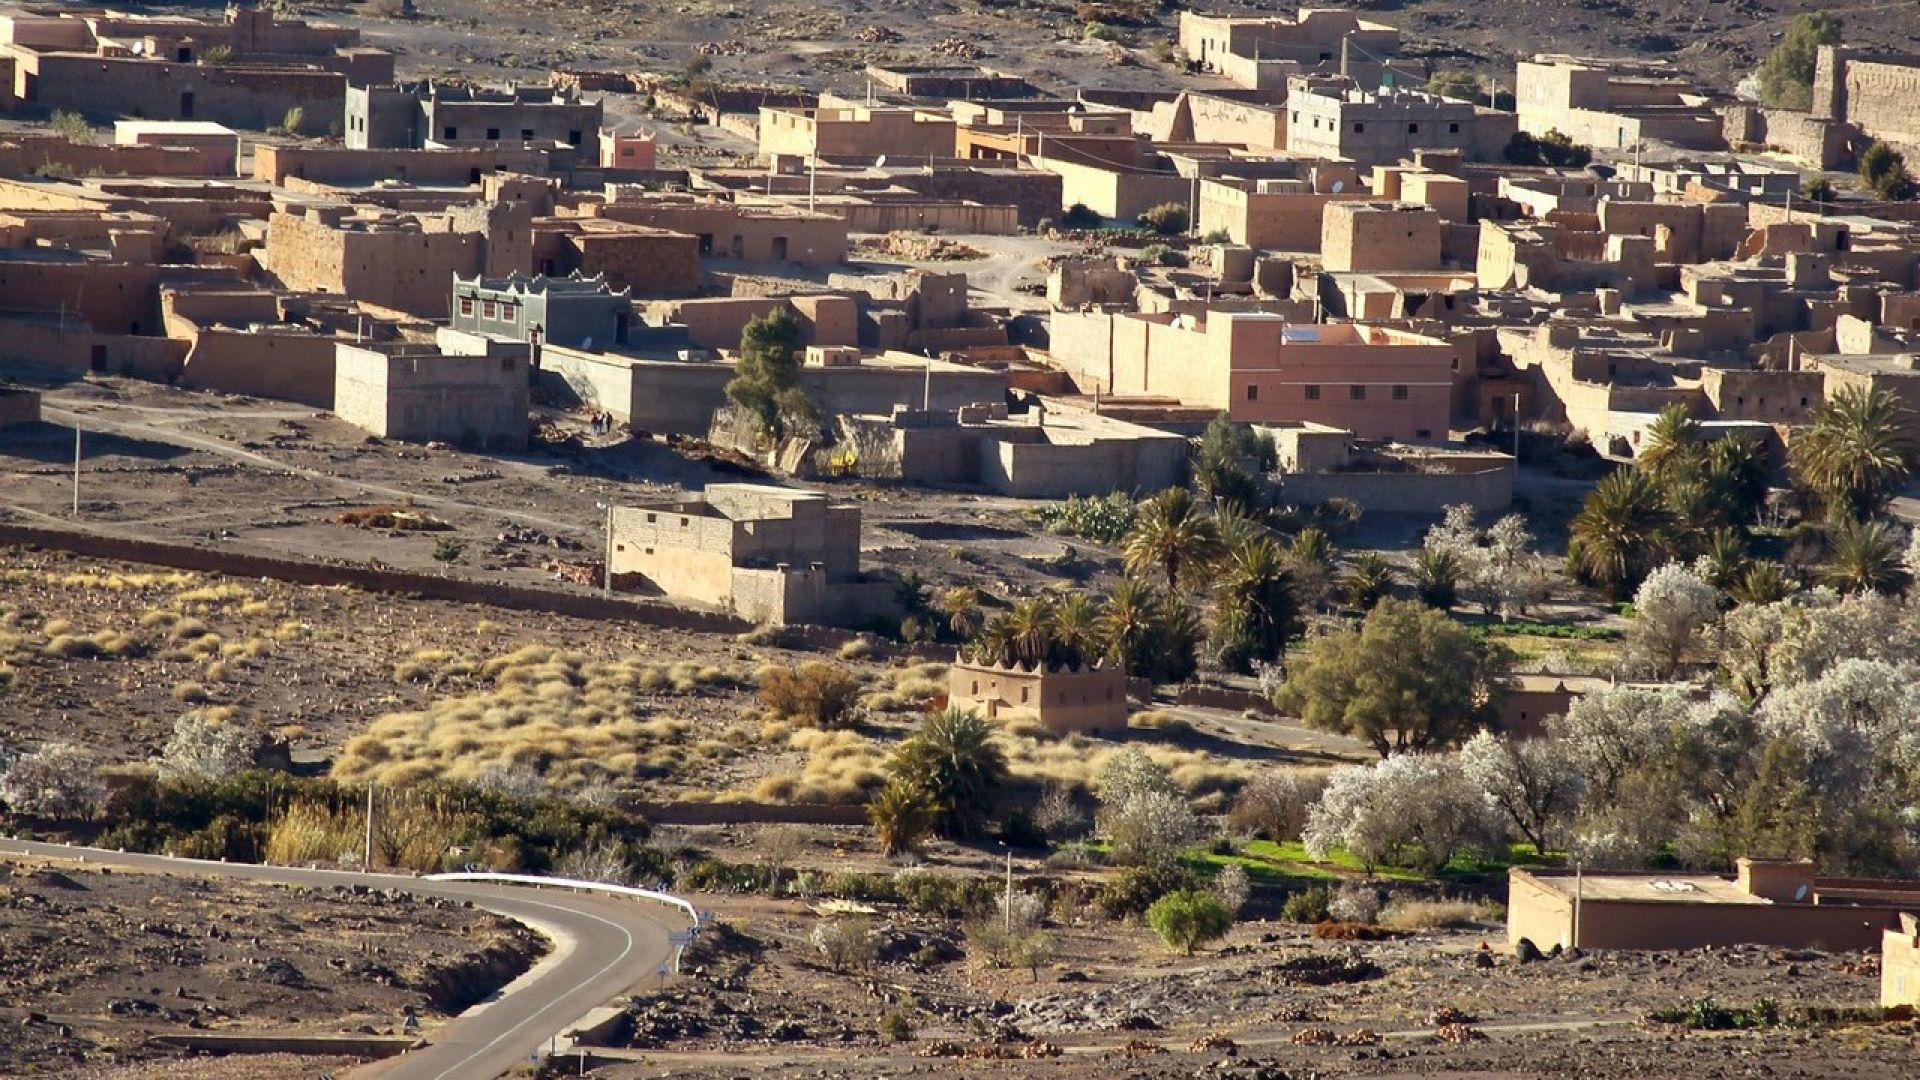 Immagine 131: In Marocco con la Yamaha Super Ténéré